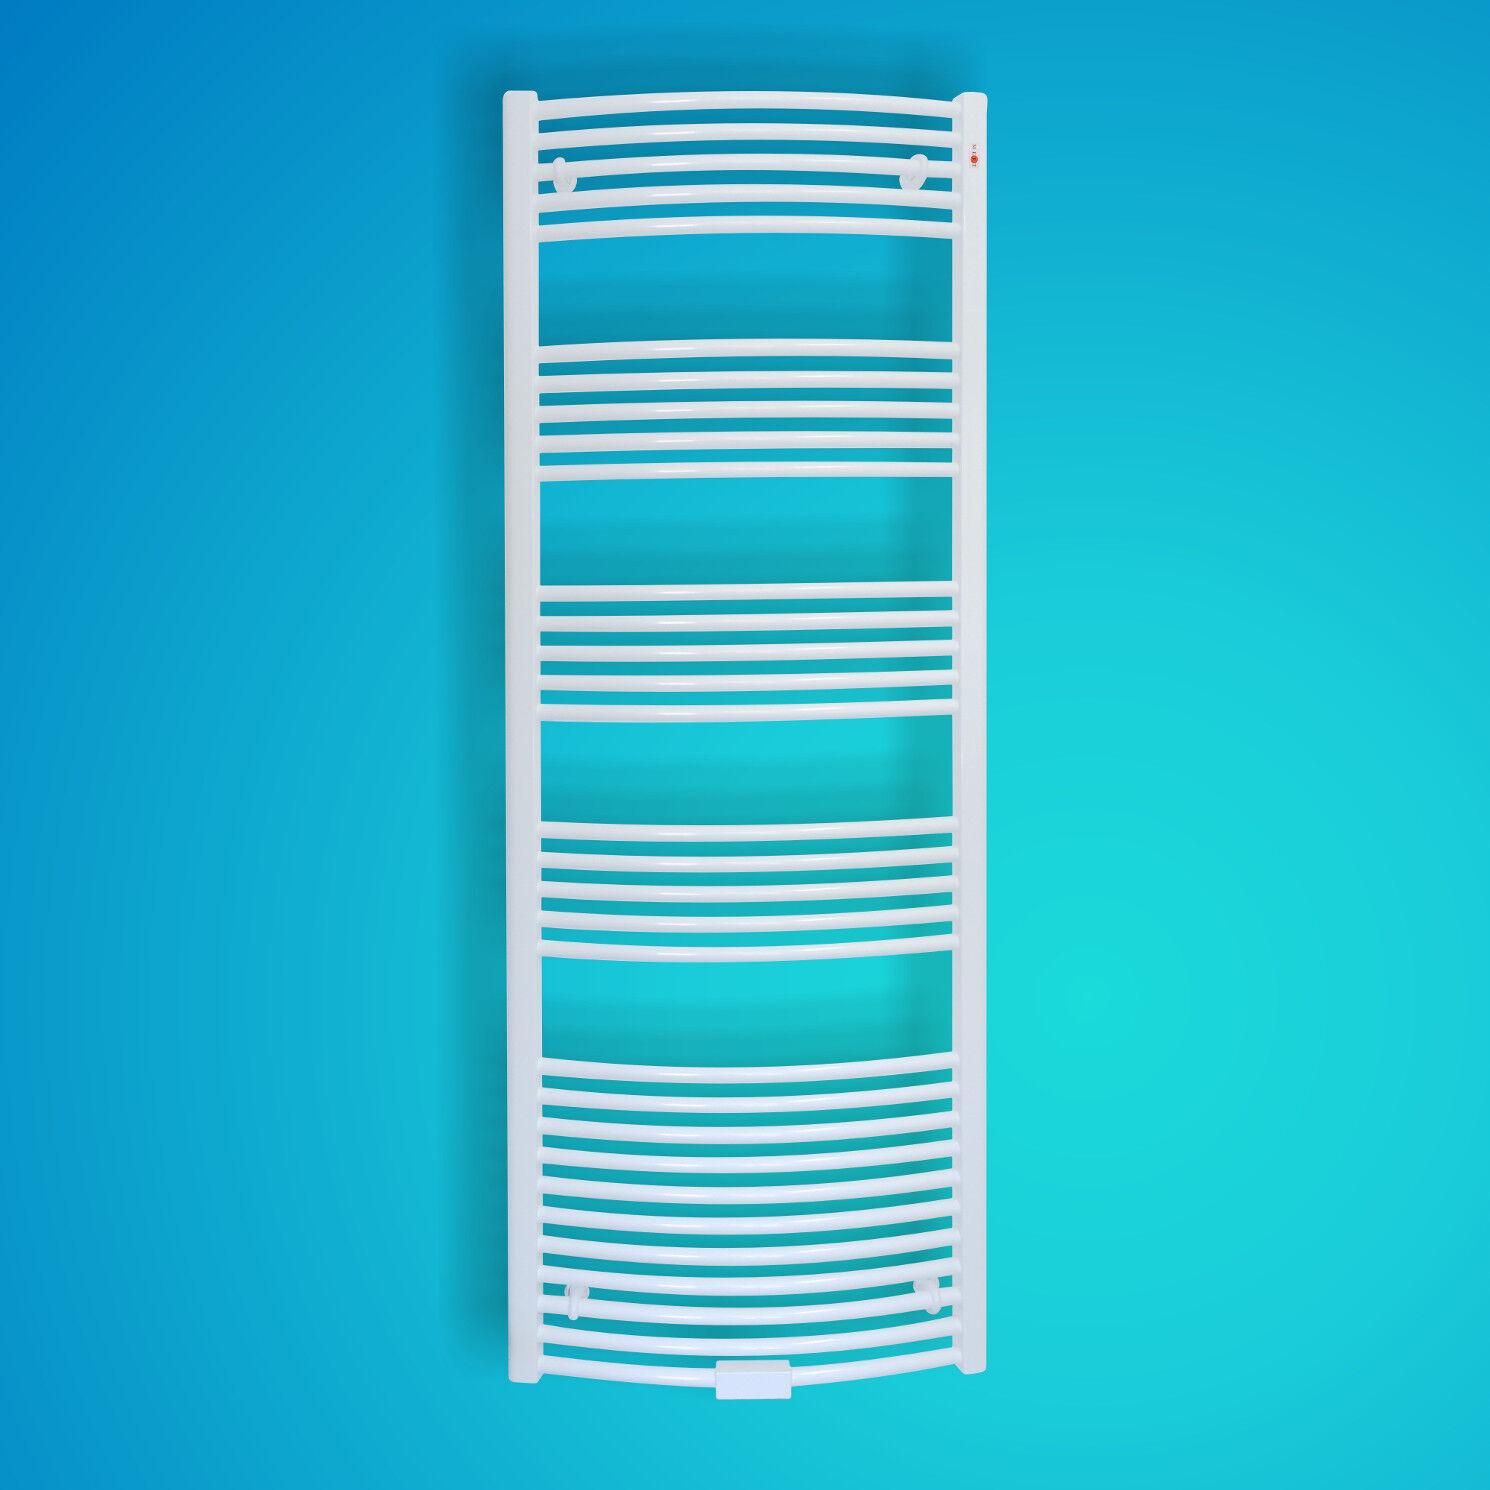 Mert Radiatoren Badheizkörper Heizkörper Standard Weiß gebogen 700 x 1400 mm